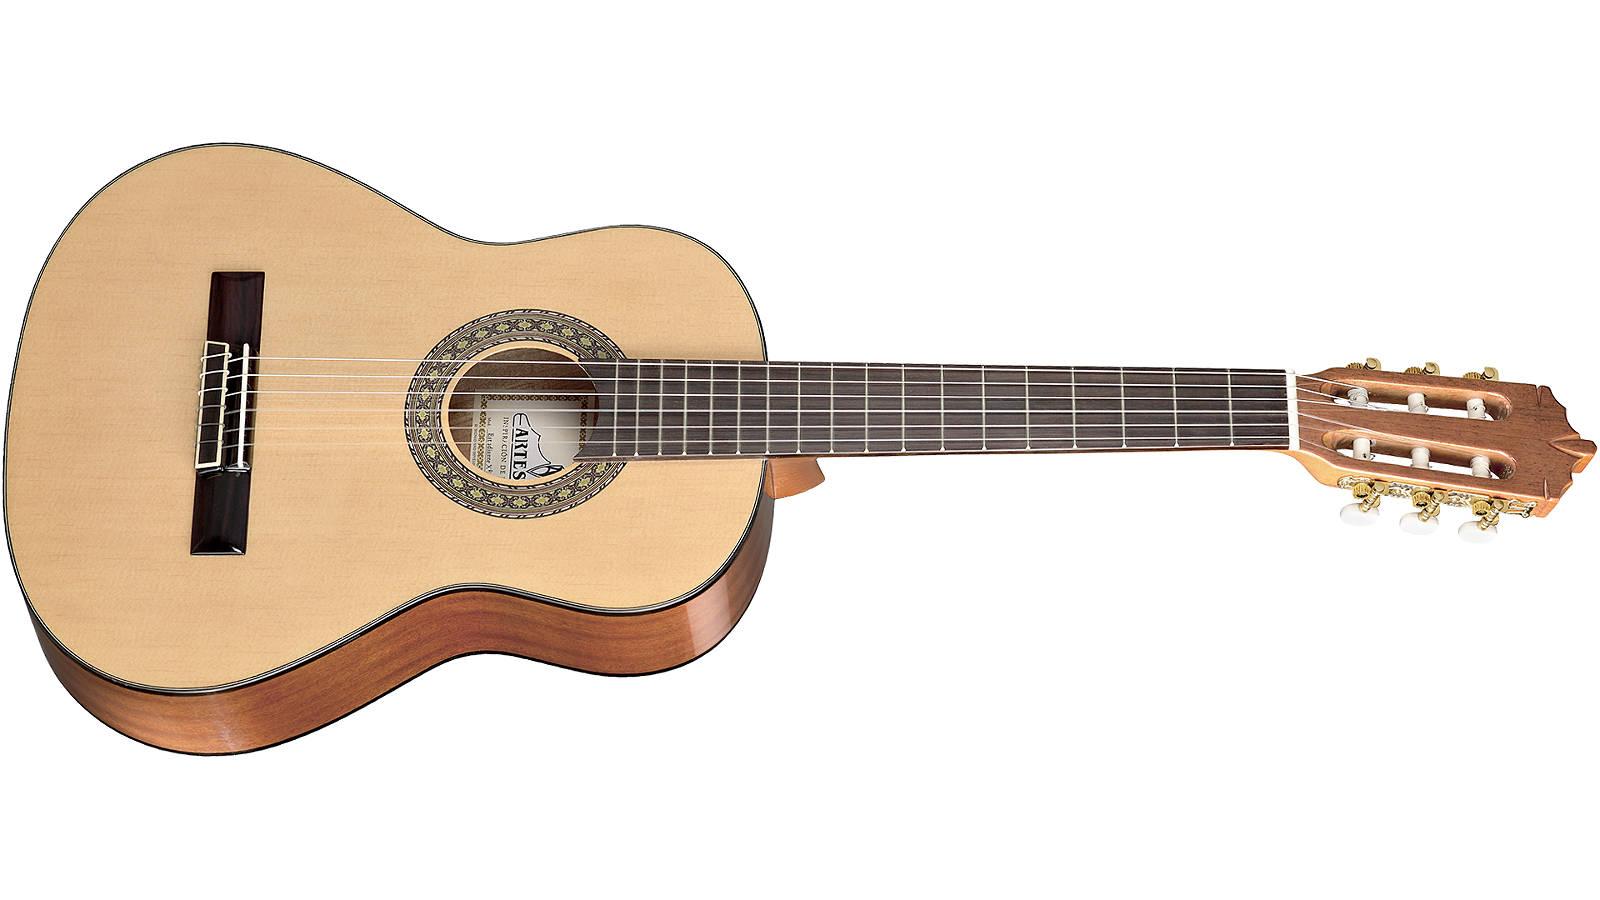 Artesano Estudiante XA-3/4 Konzertgitarre